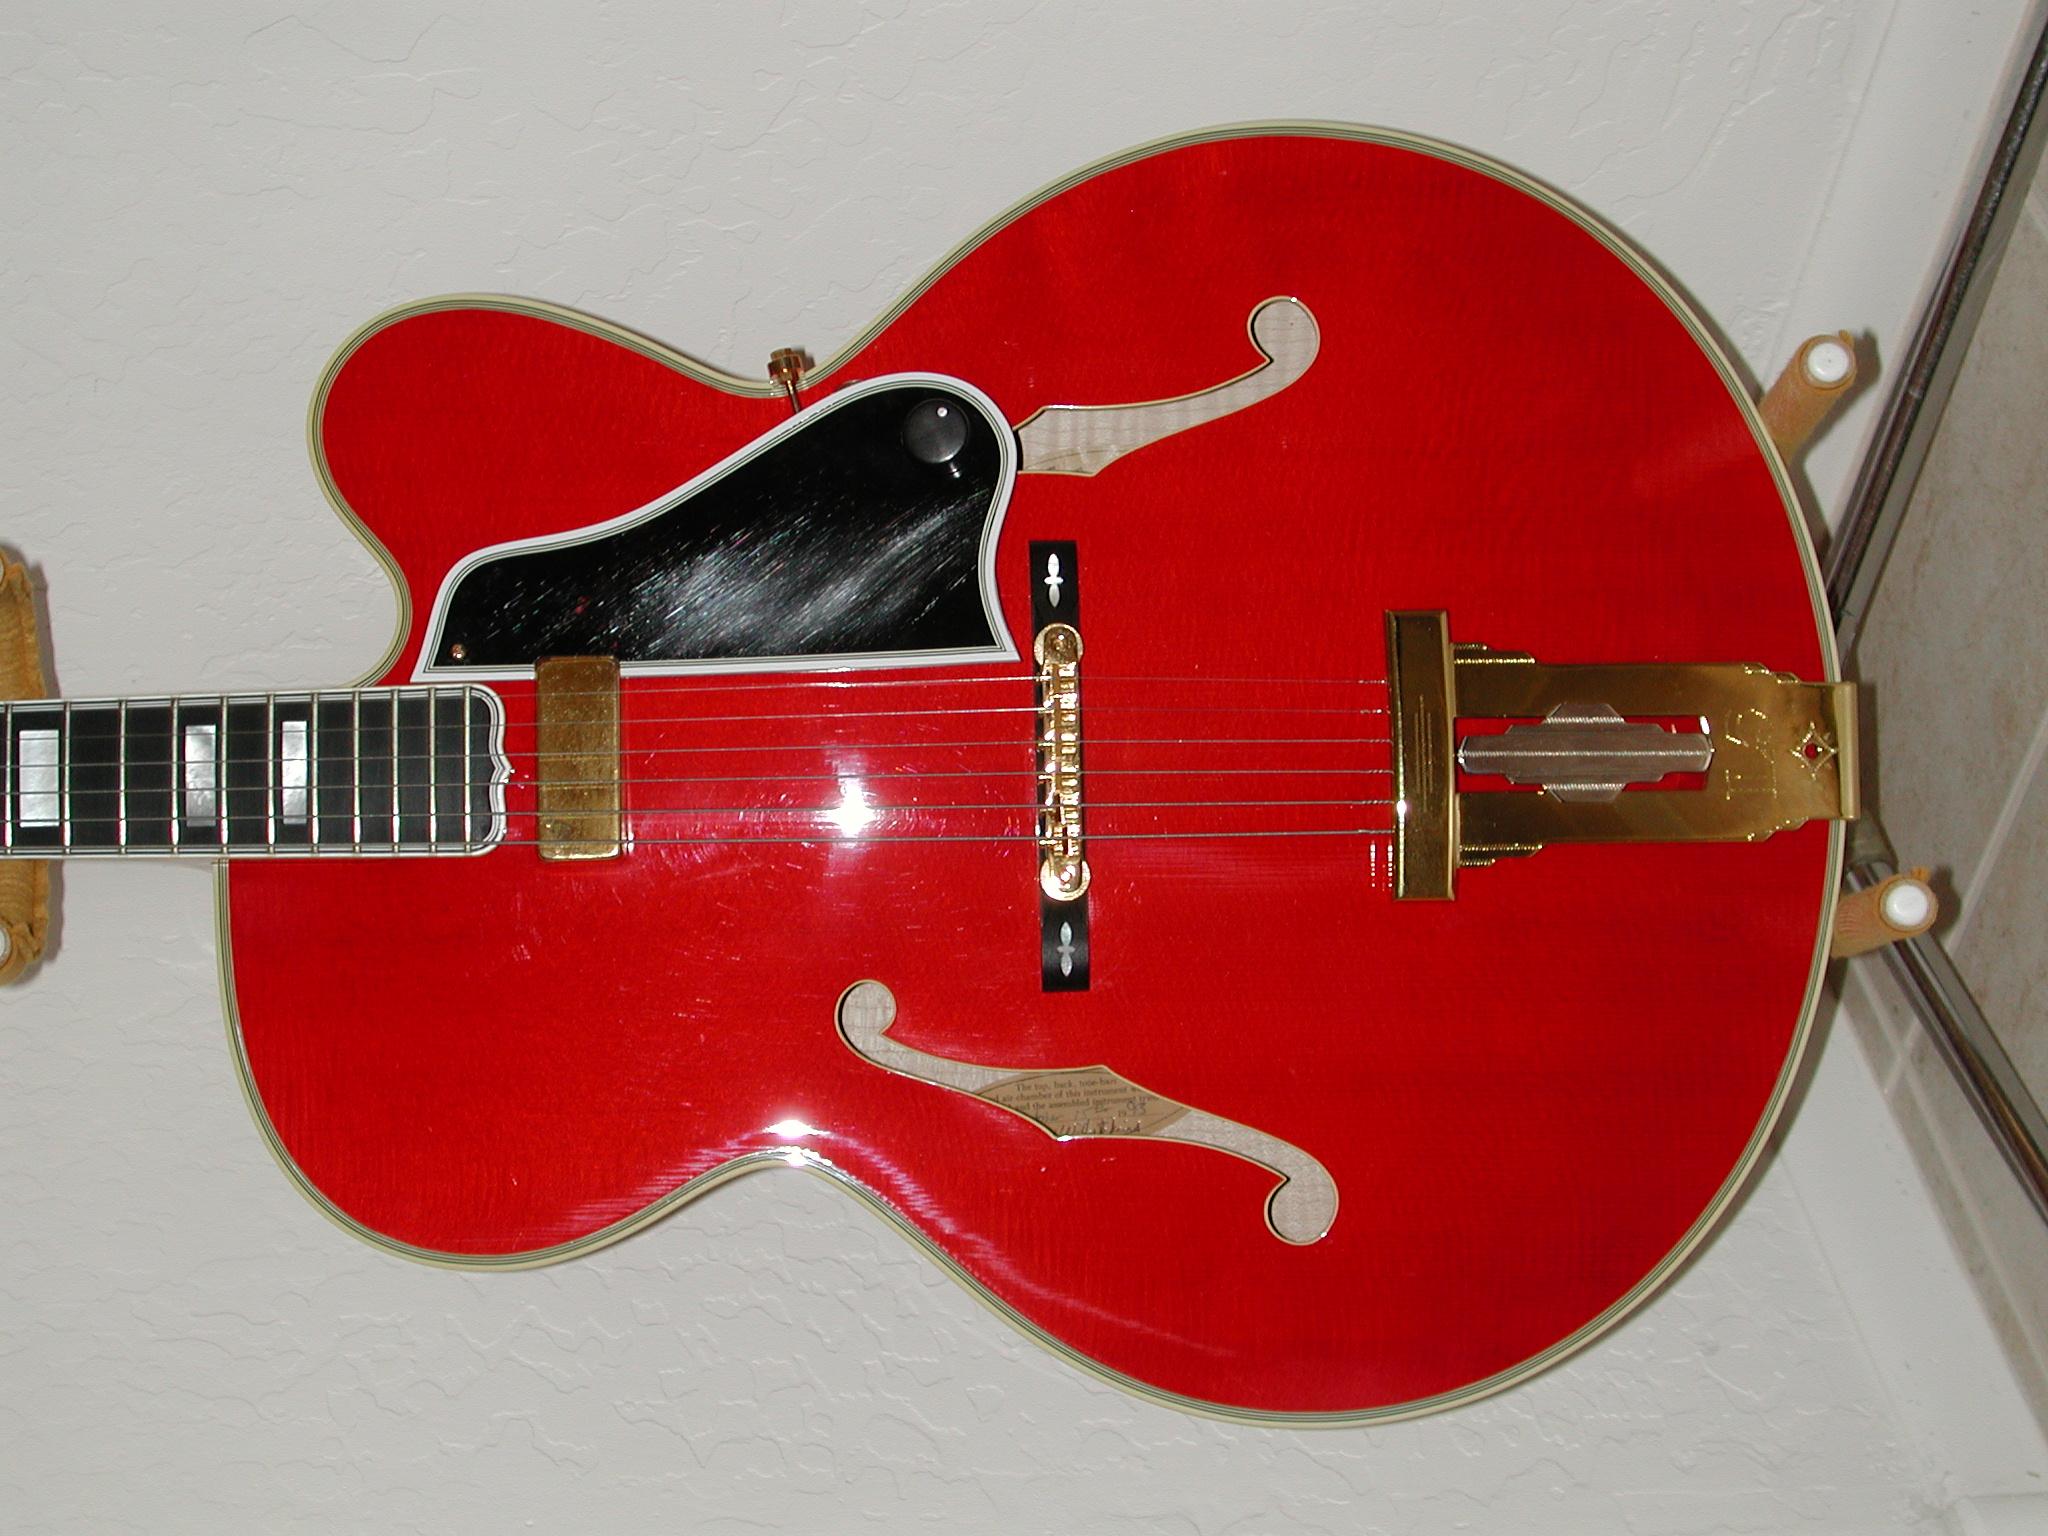 Your Gibson L-5 Choice-dscn3131-jpg